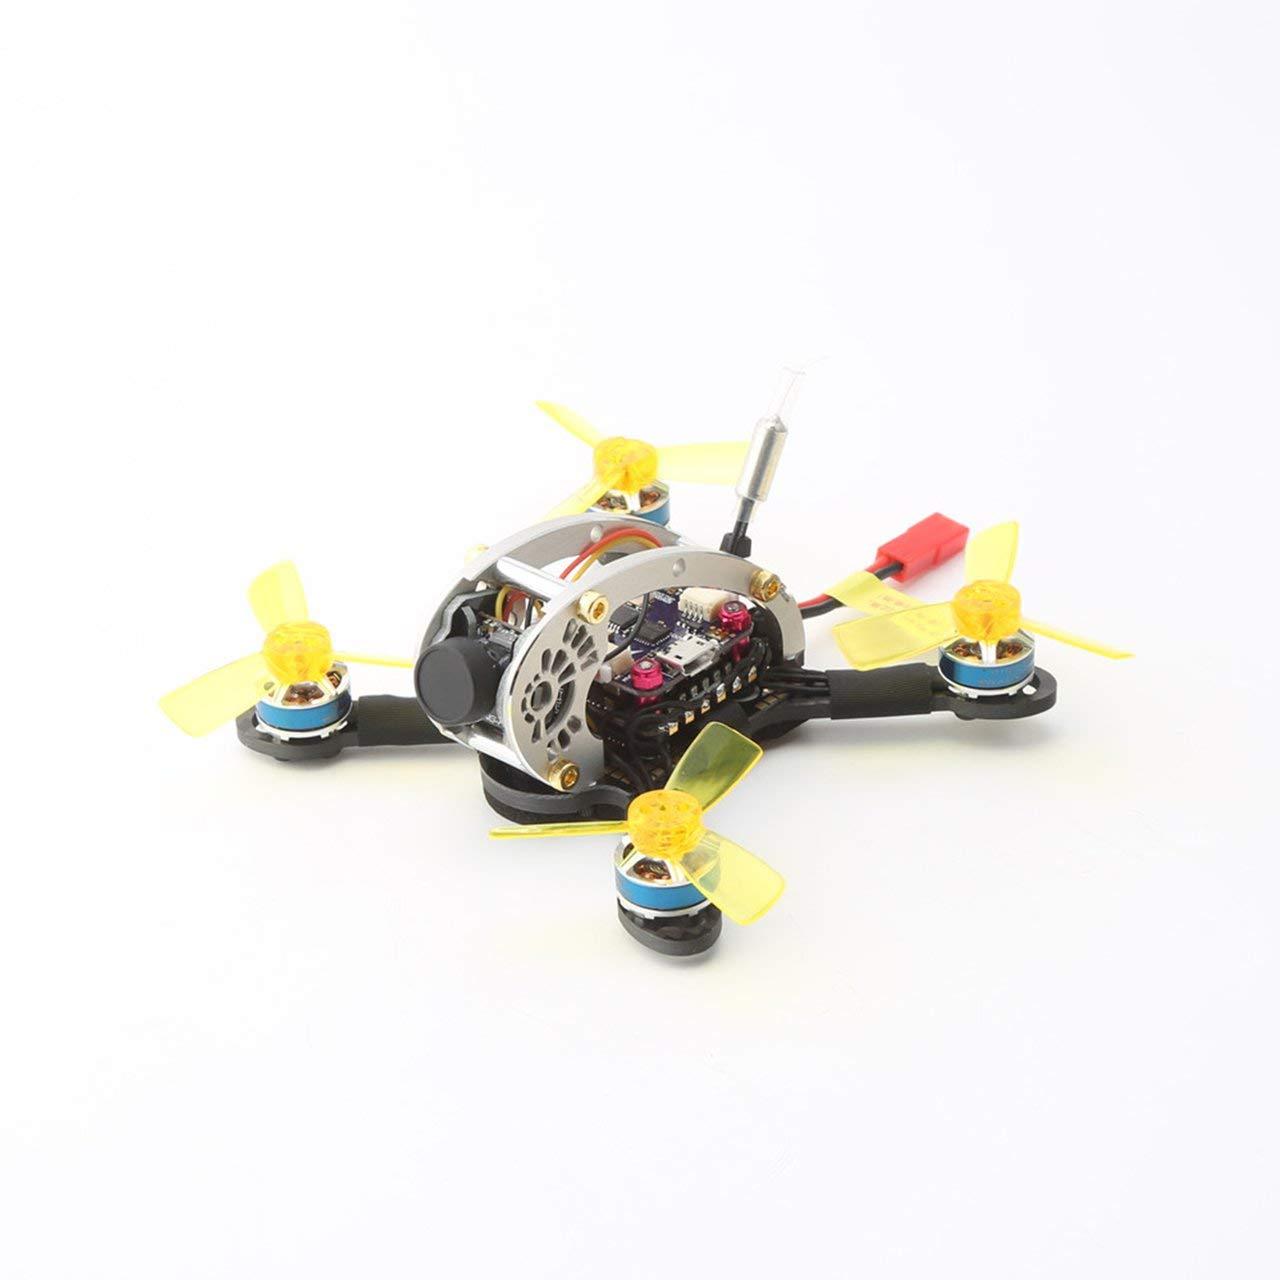 Jasnyfall LDARC FPVEGG V2 5.8G Brushless OSD Kamera AC900 RX Mini FPV RC Racing Drone PNP - Schwarz & Gelb